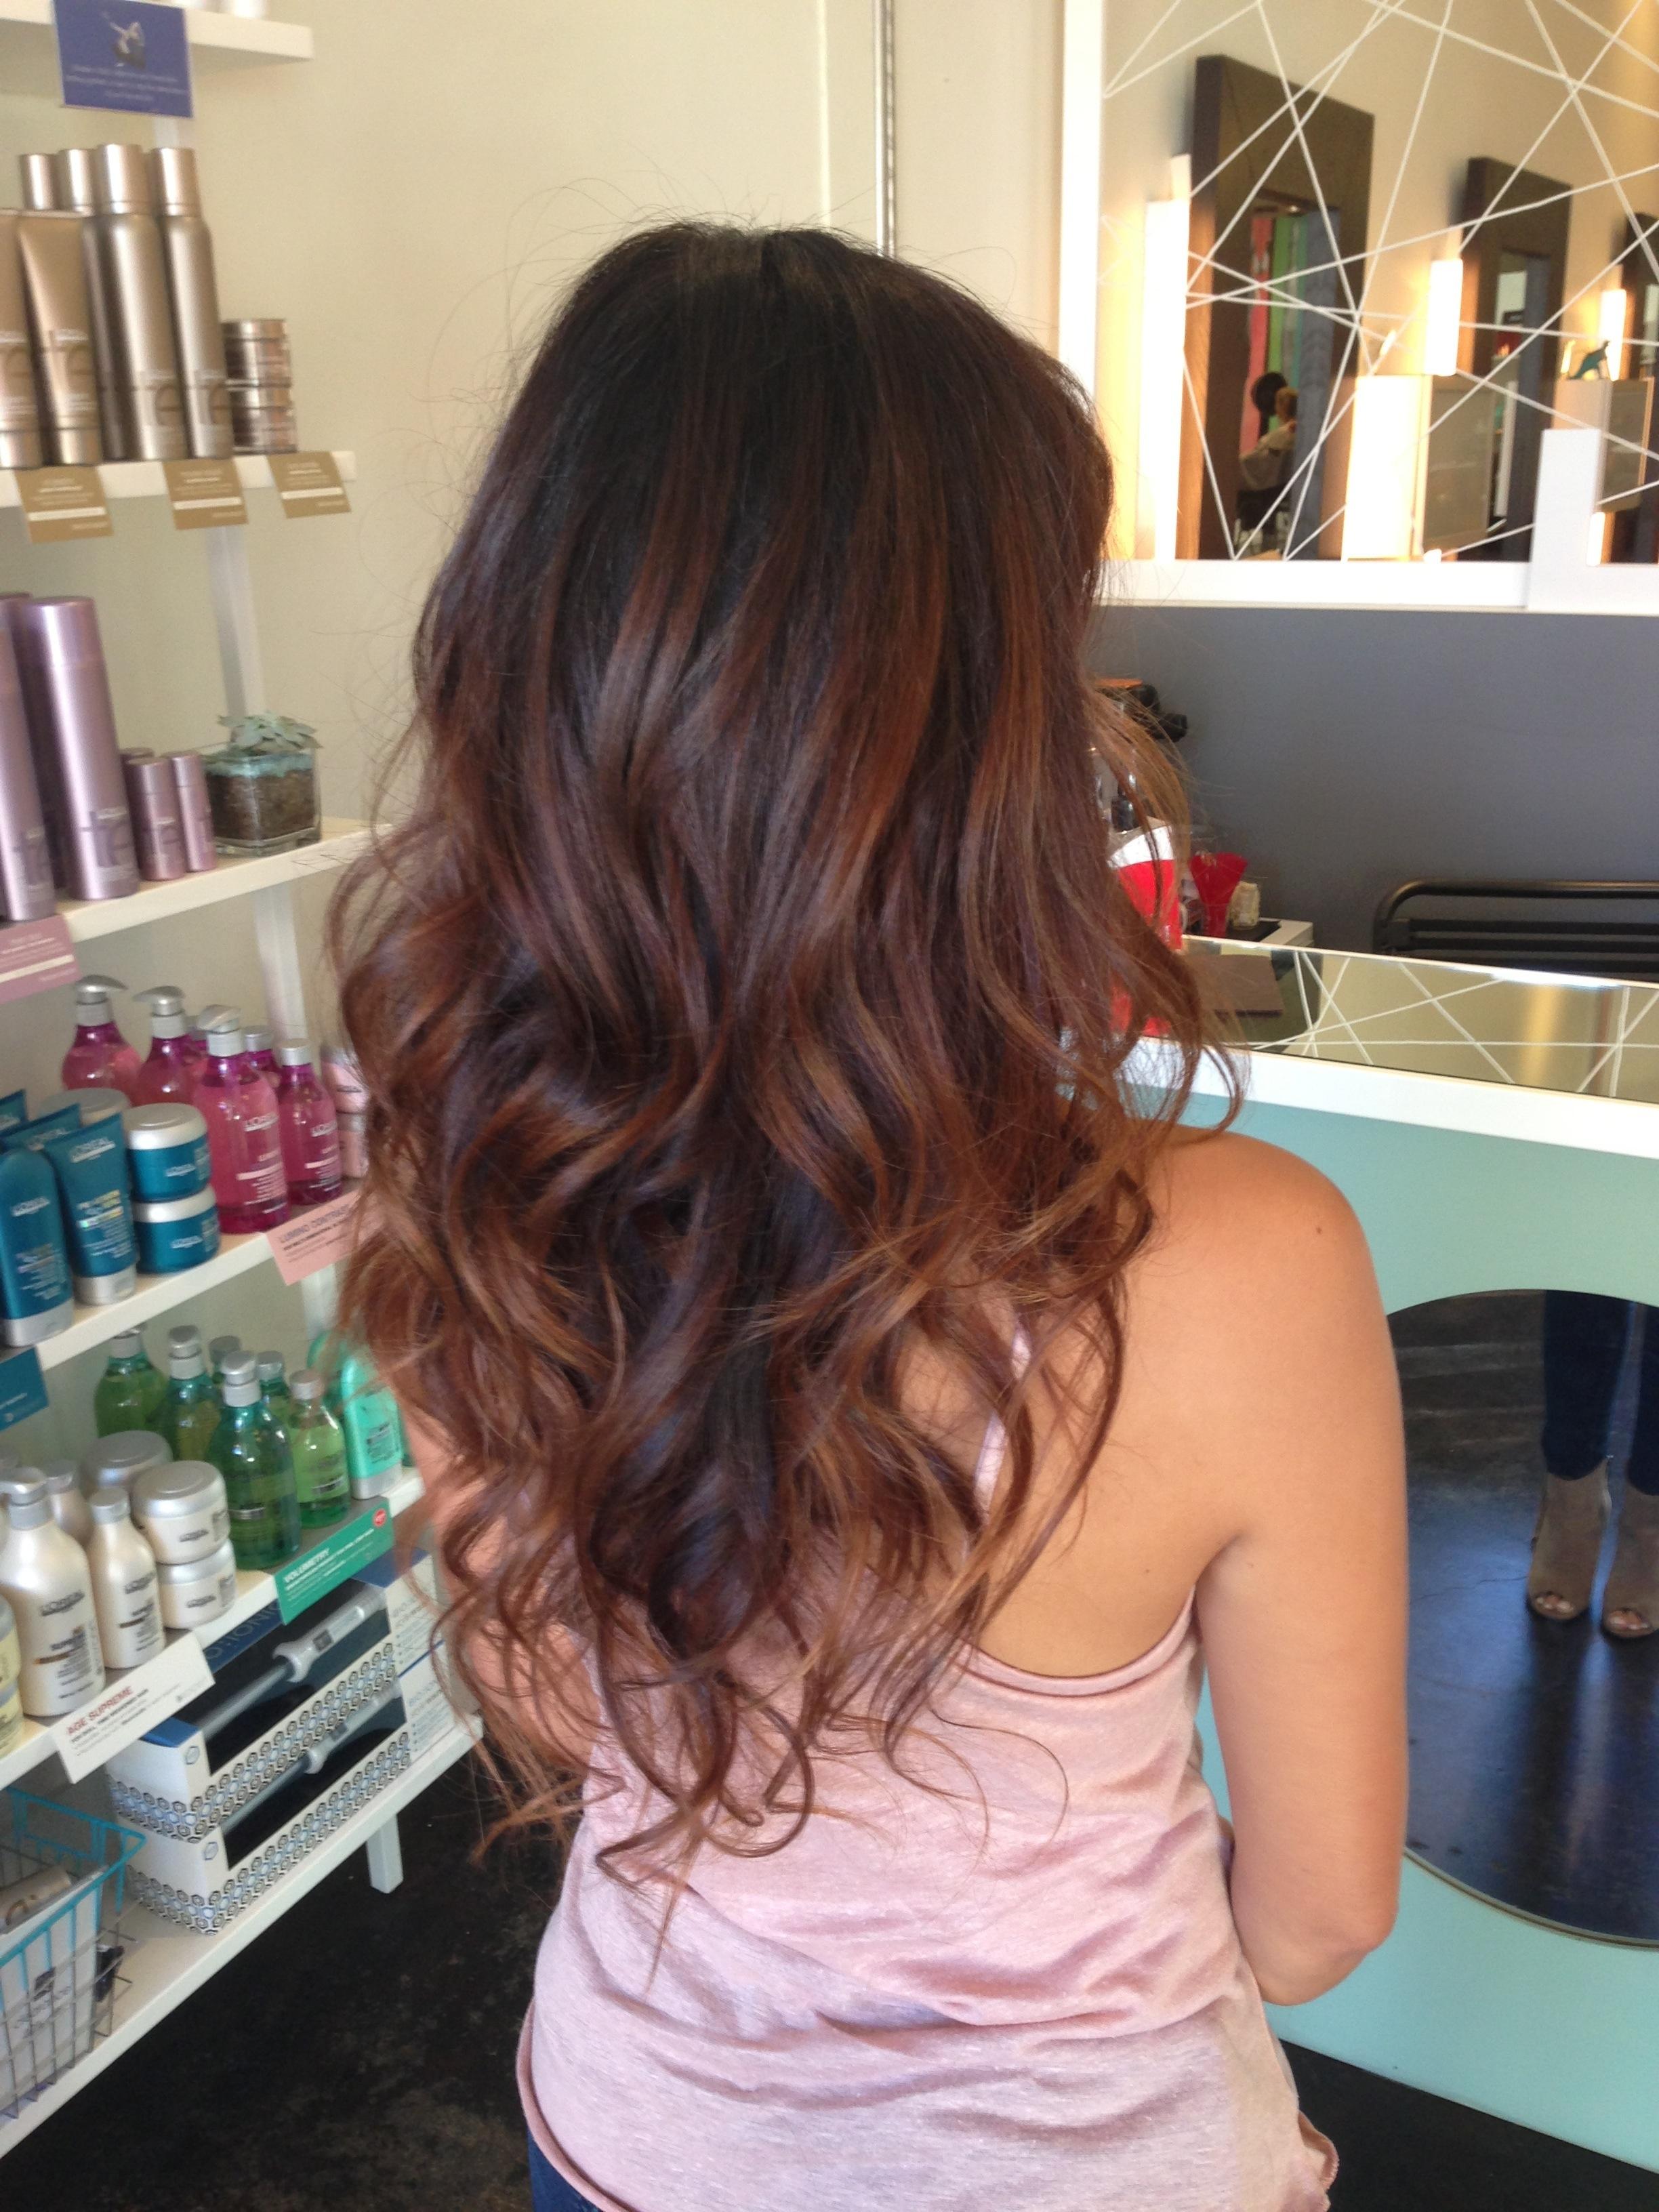 Andrea Miller Lefevre Hair San Diego Balayage Specialist Color